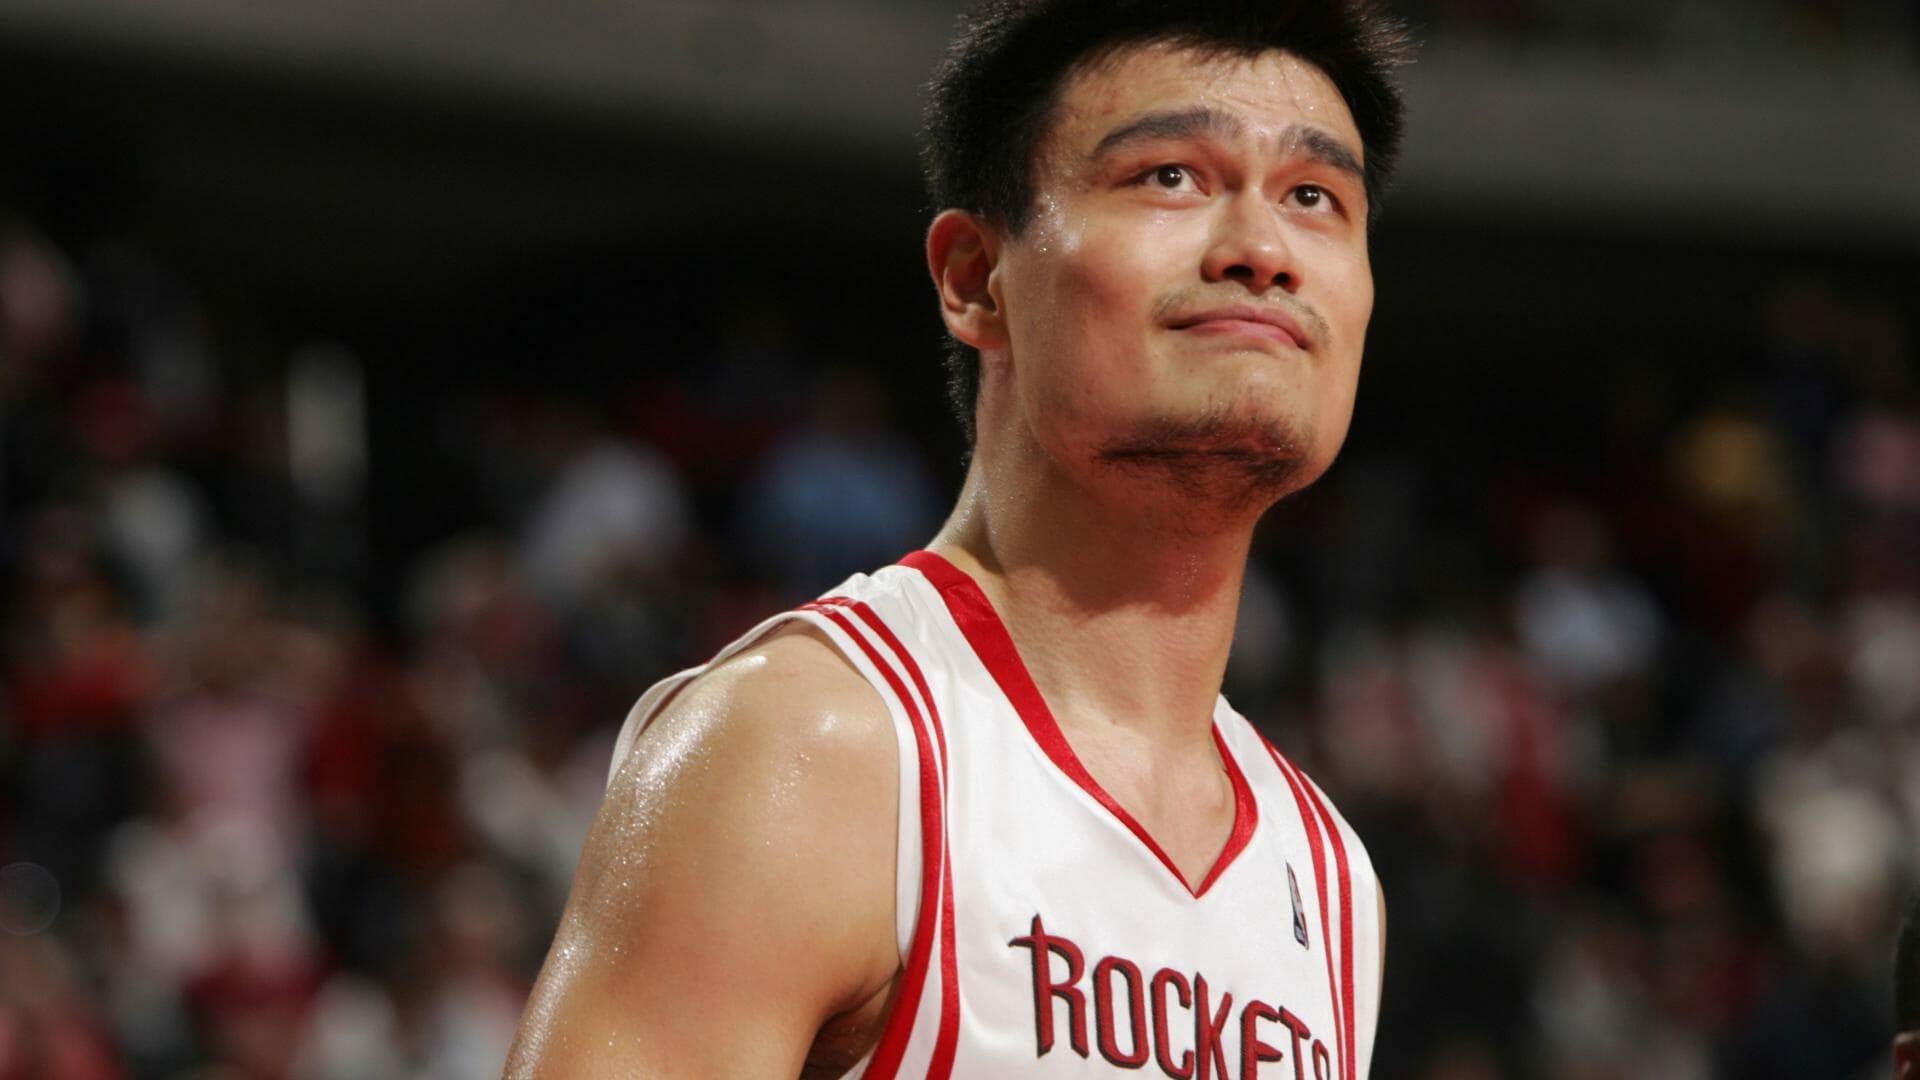 Les plus grands sportifs chinois